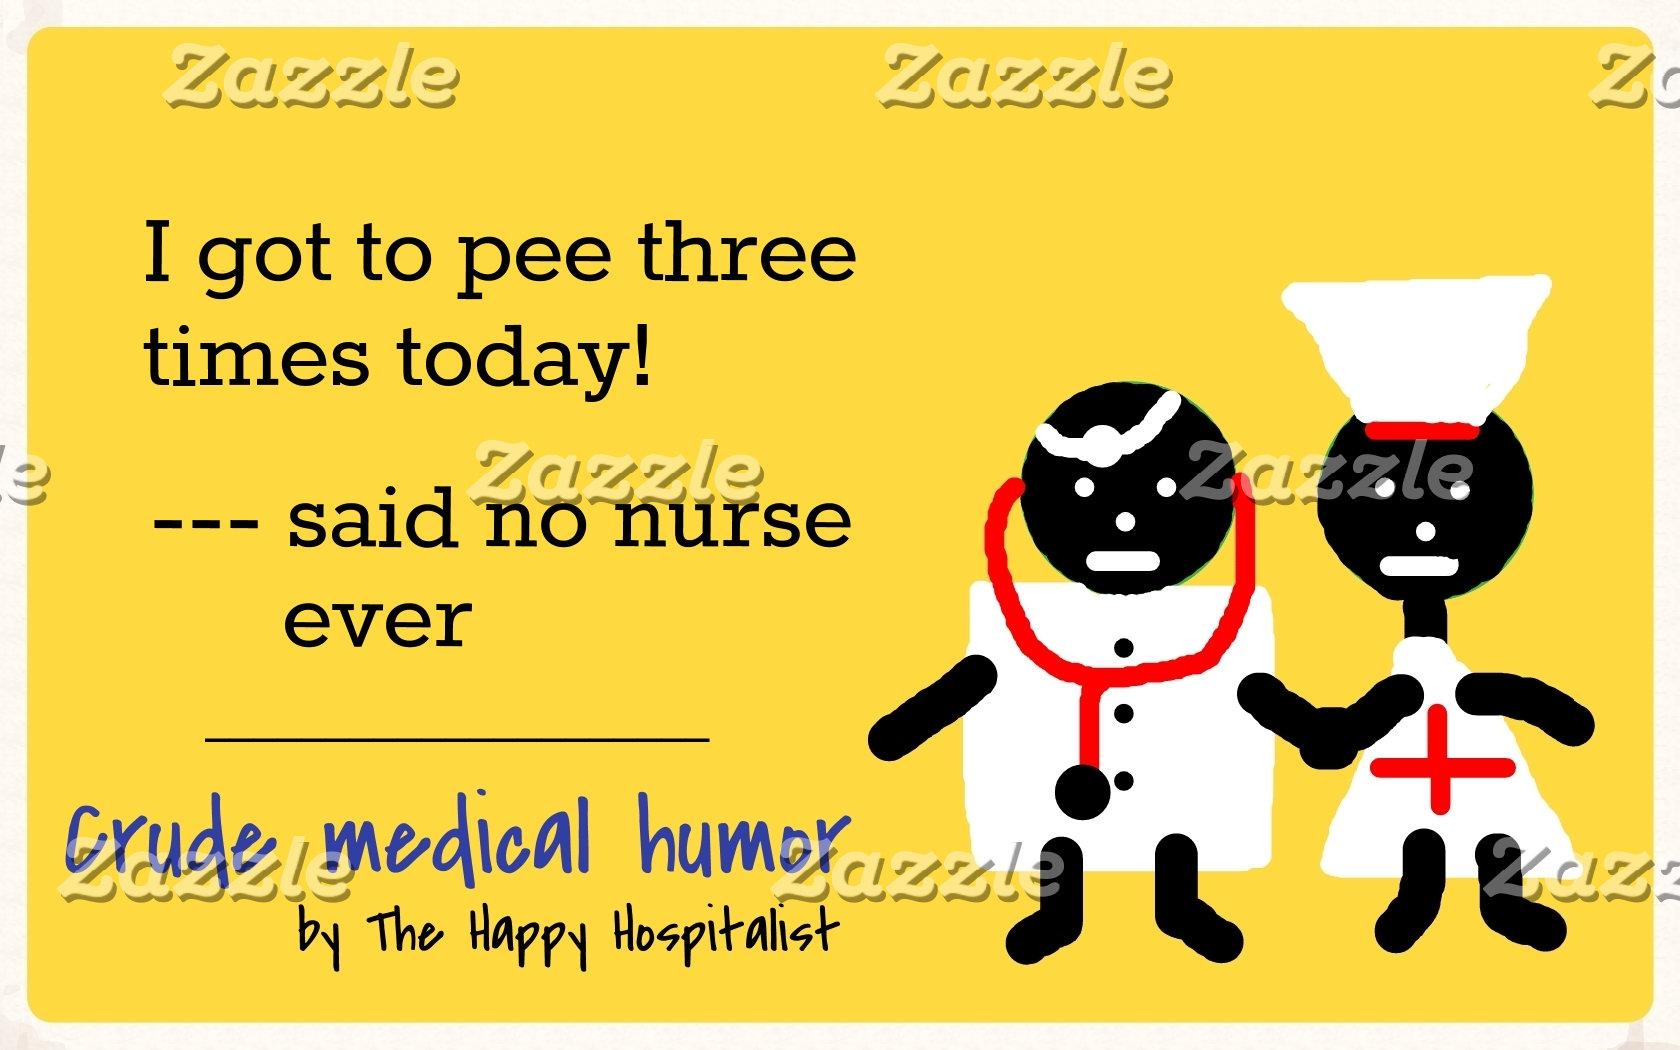 I got to pee three times today said no nurse ev...